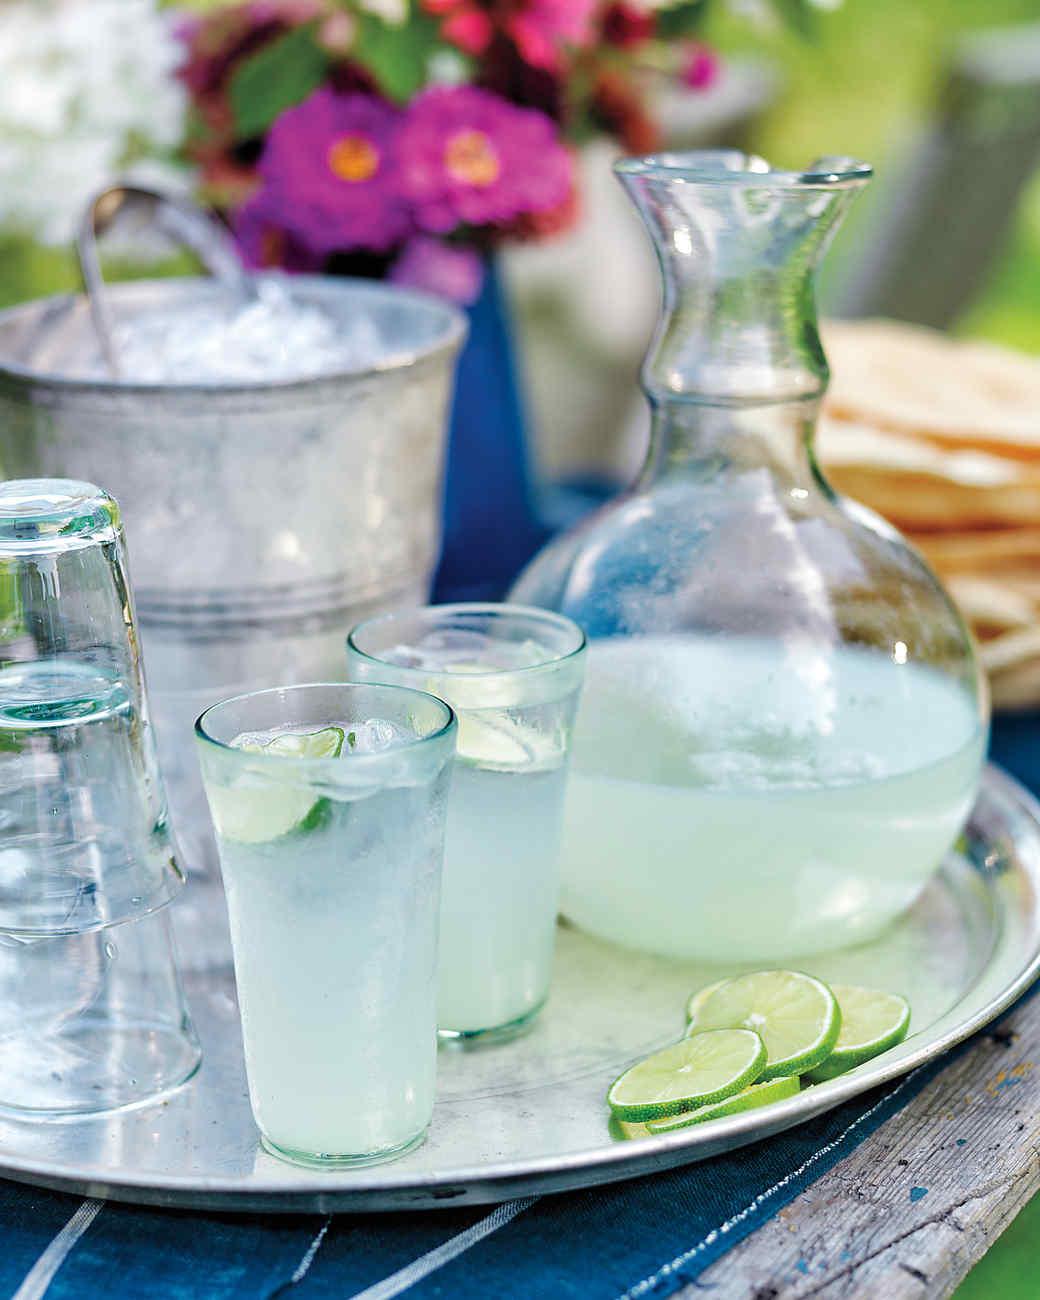 lime-drink-ee-summer-0156-md109287.jpg